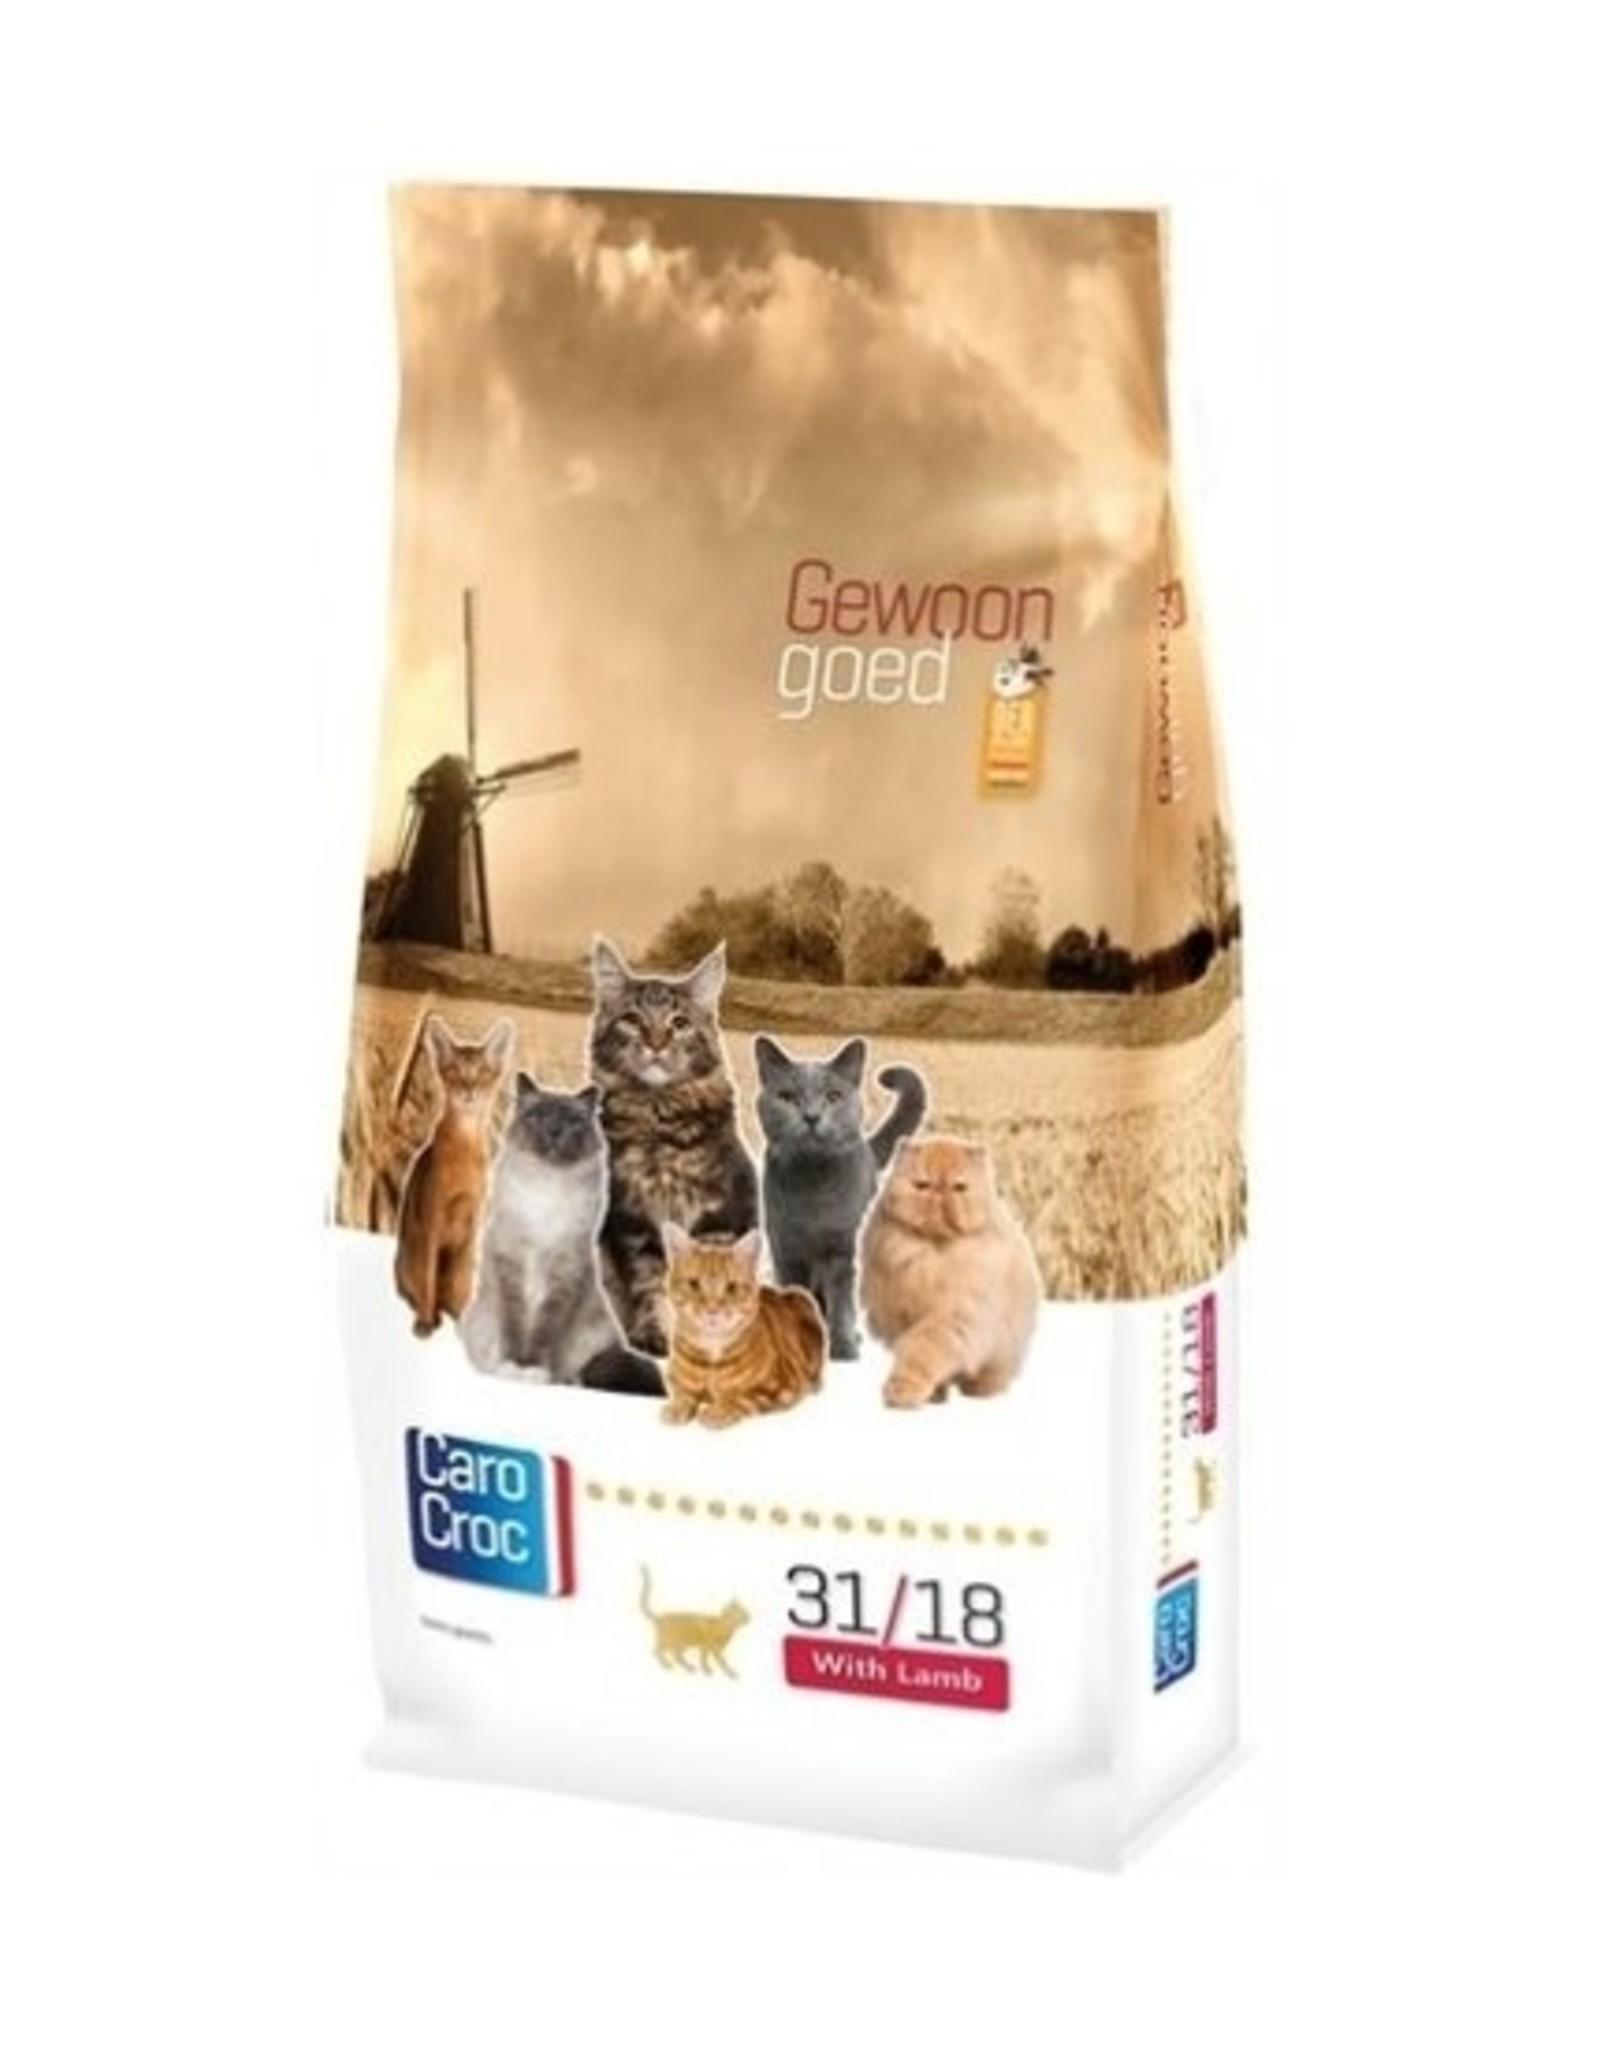 Sanimed Sanimed Carocroc Kat 31/18 Lamb Rice 2kg